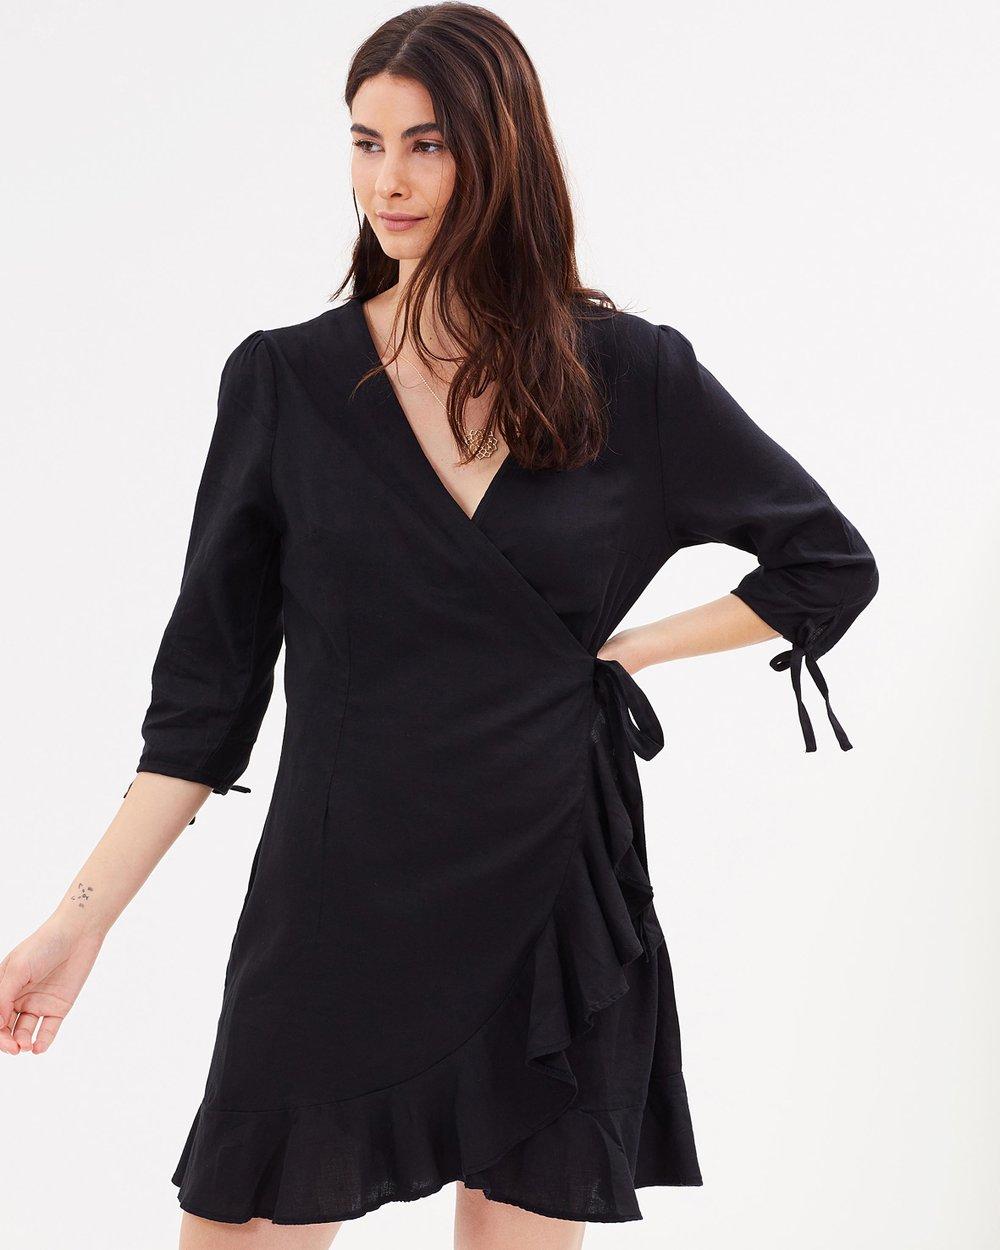 Woven Charli 3 4 Sleeve Wrap Dress by Cotton On Online  0ba2e23b25